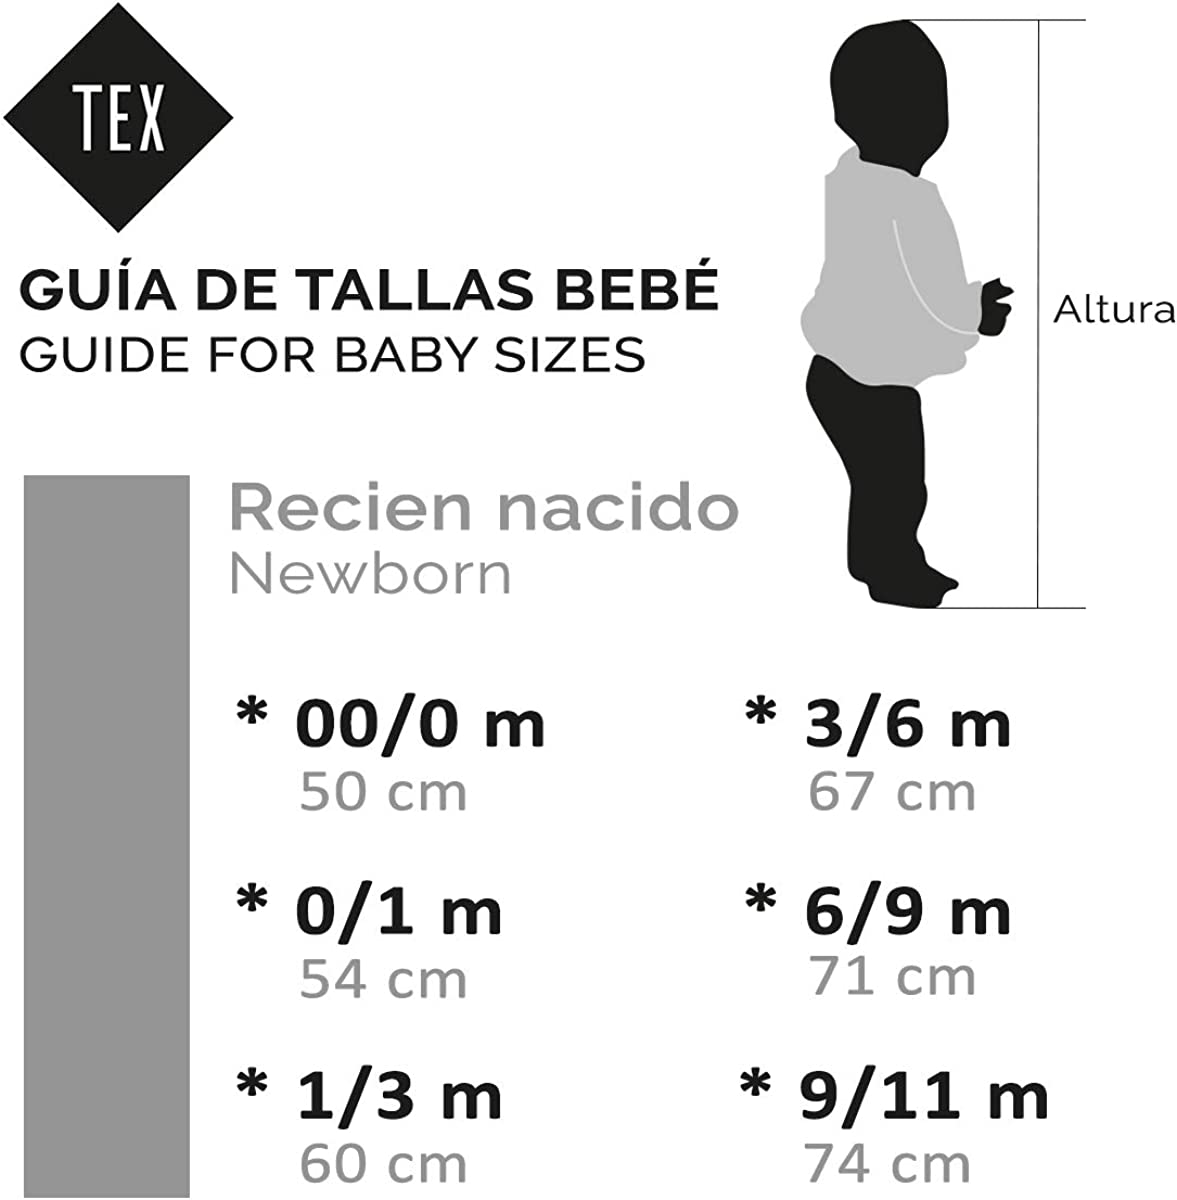 Vestido Sin Manga para Reci/én Nacido Tex